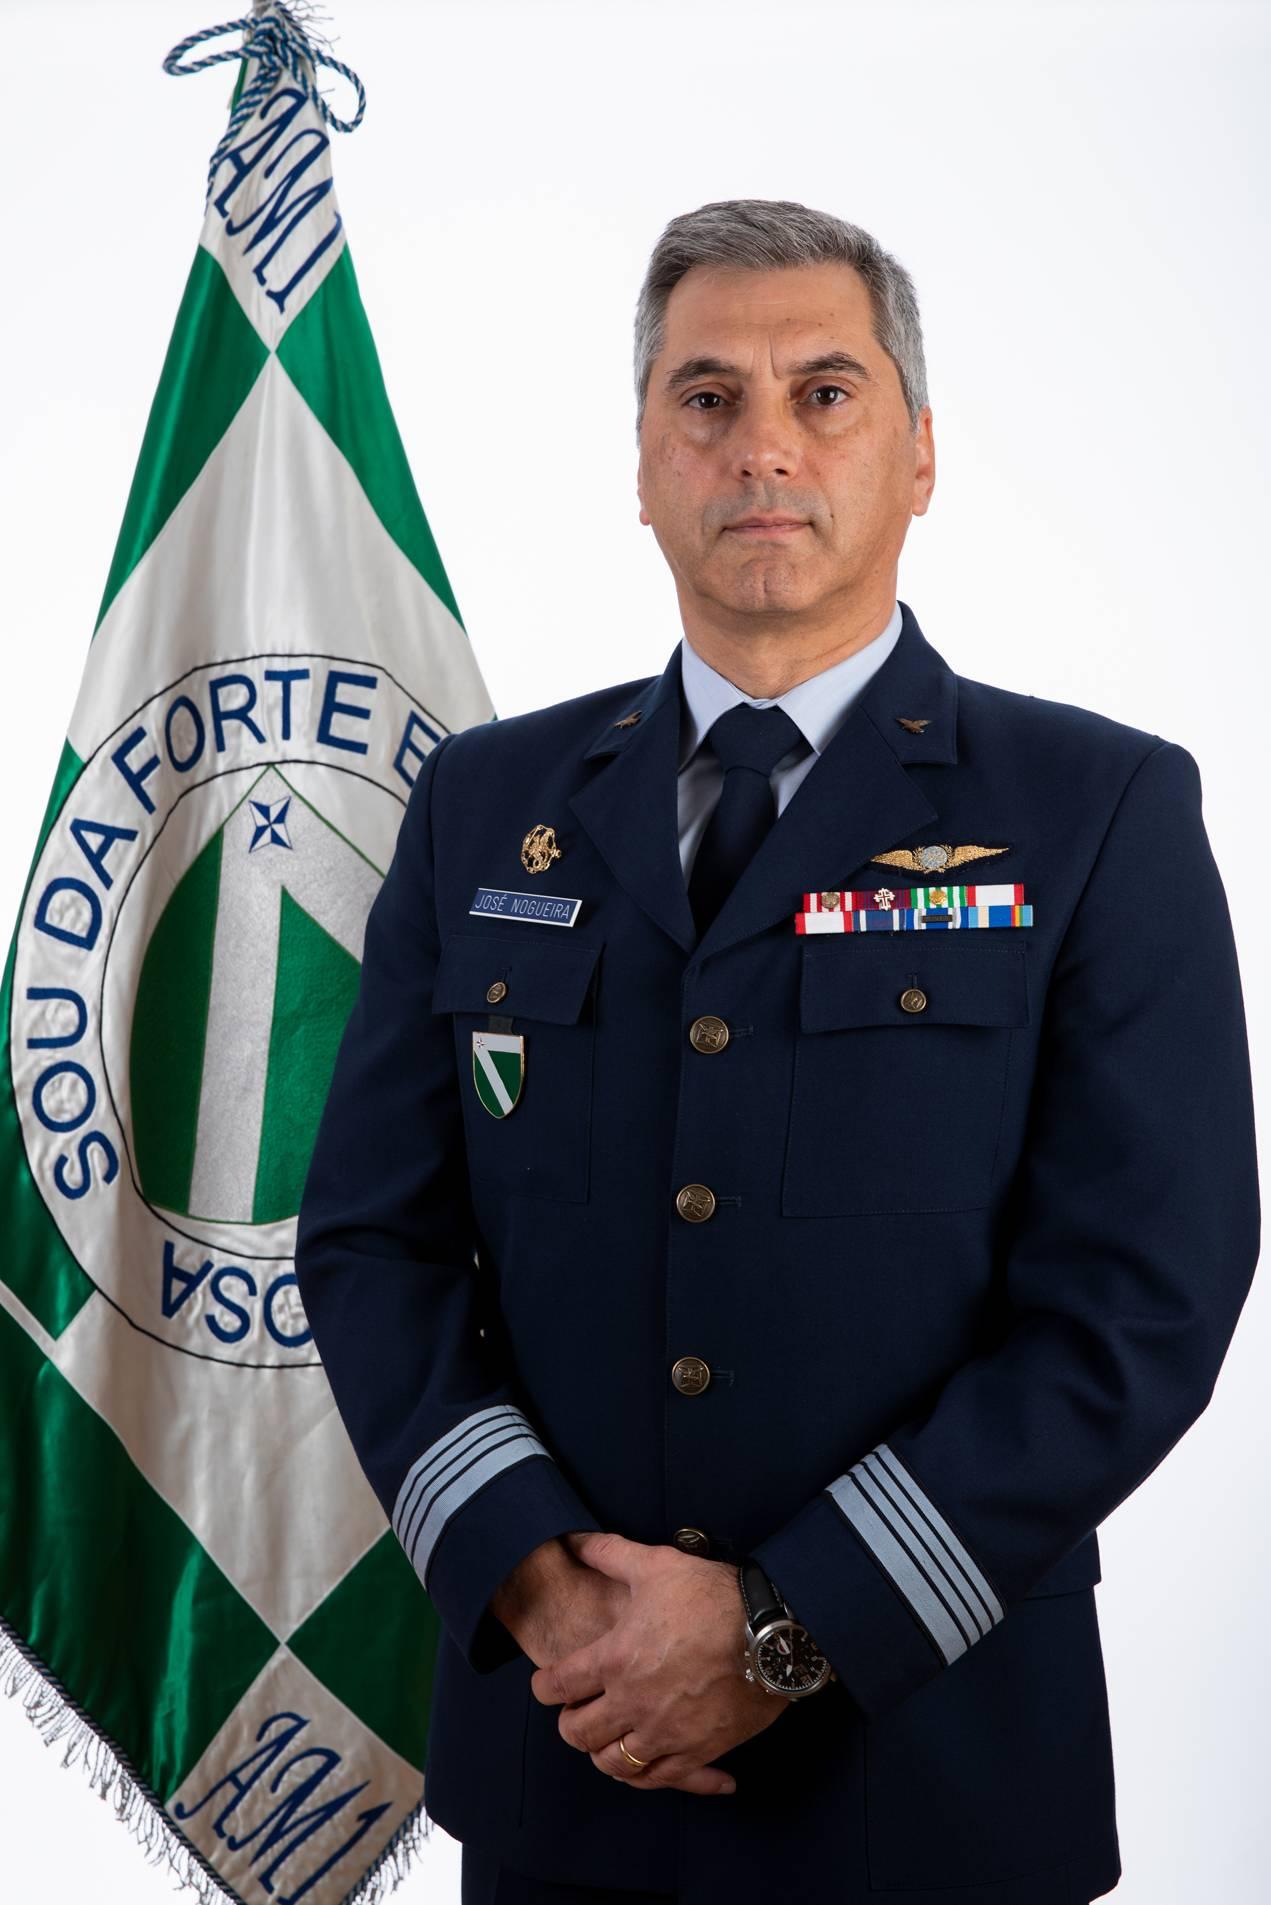 Foto de Coronel José Alberto da Silva Nogueira